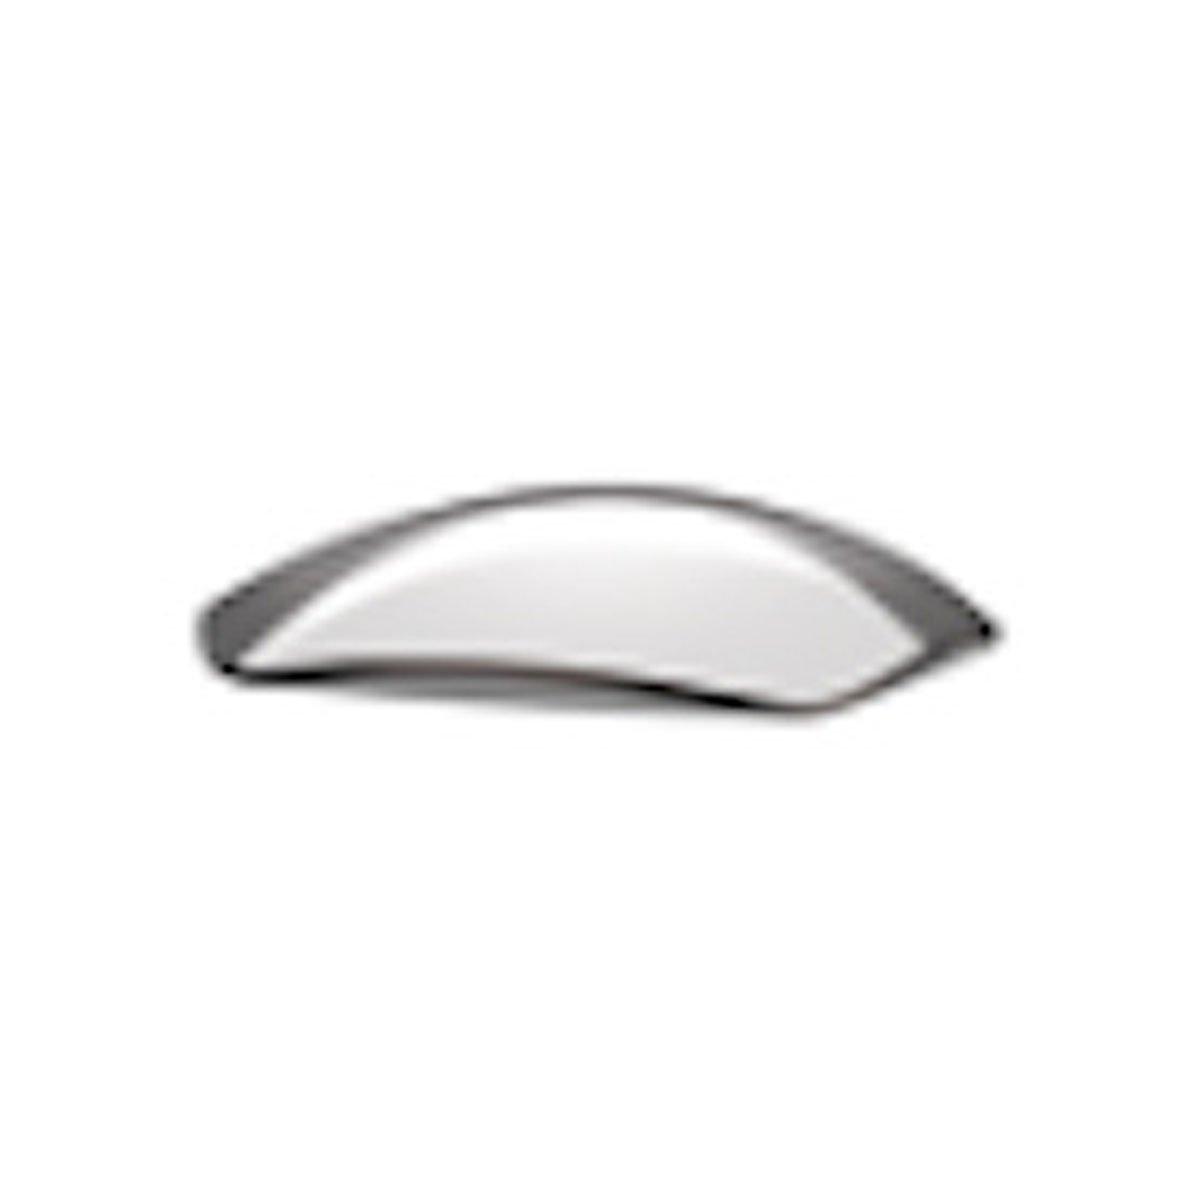 42c101fdcd Get Quotations · Nike Skylon Ace XV Pro Replacement Lenses - EVA171